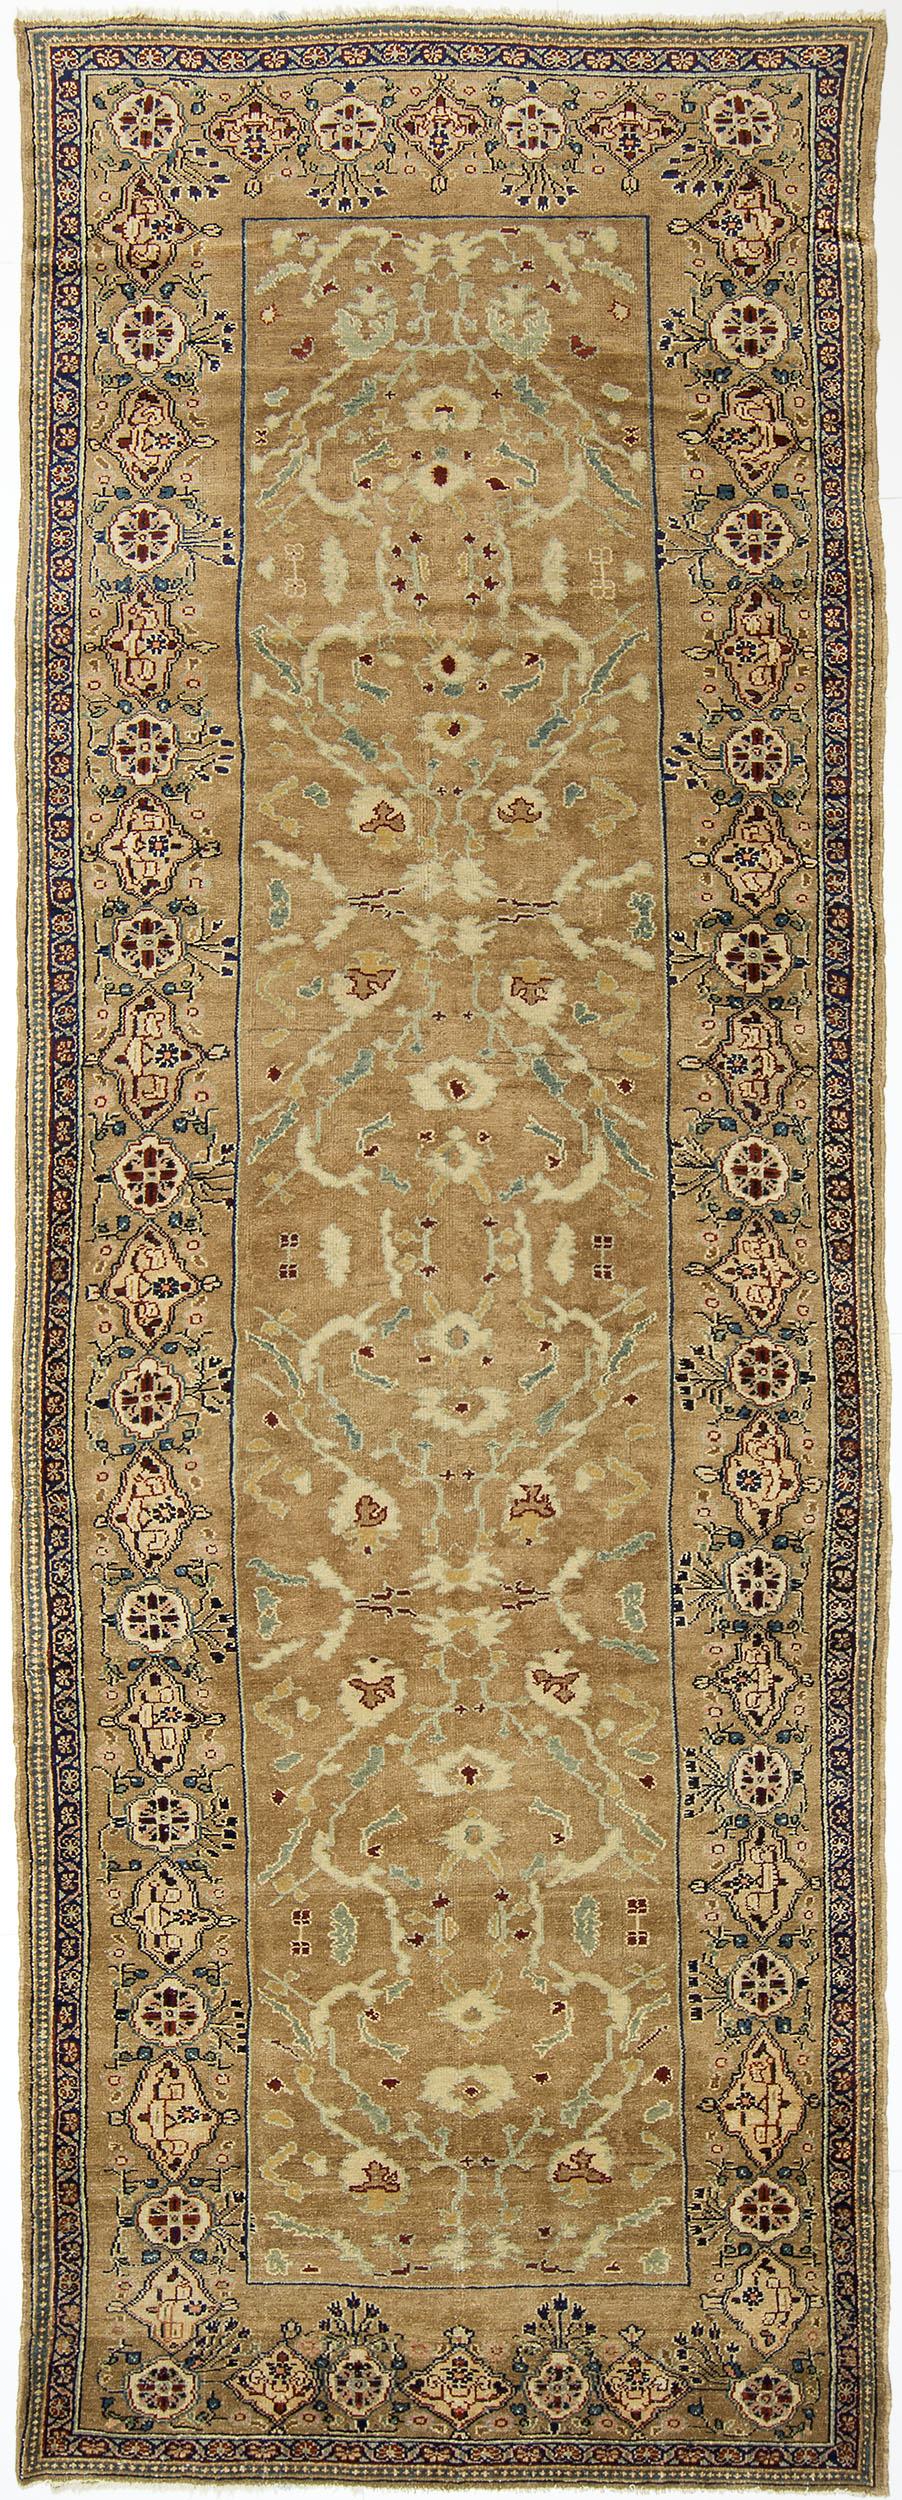 "NW Persian Gallery Carpet 15' 0"" x 5' 1"""